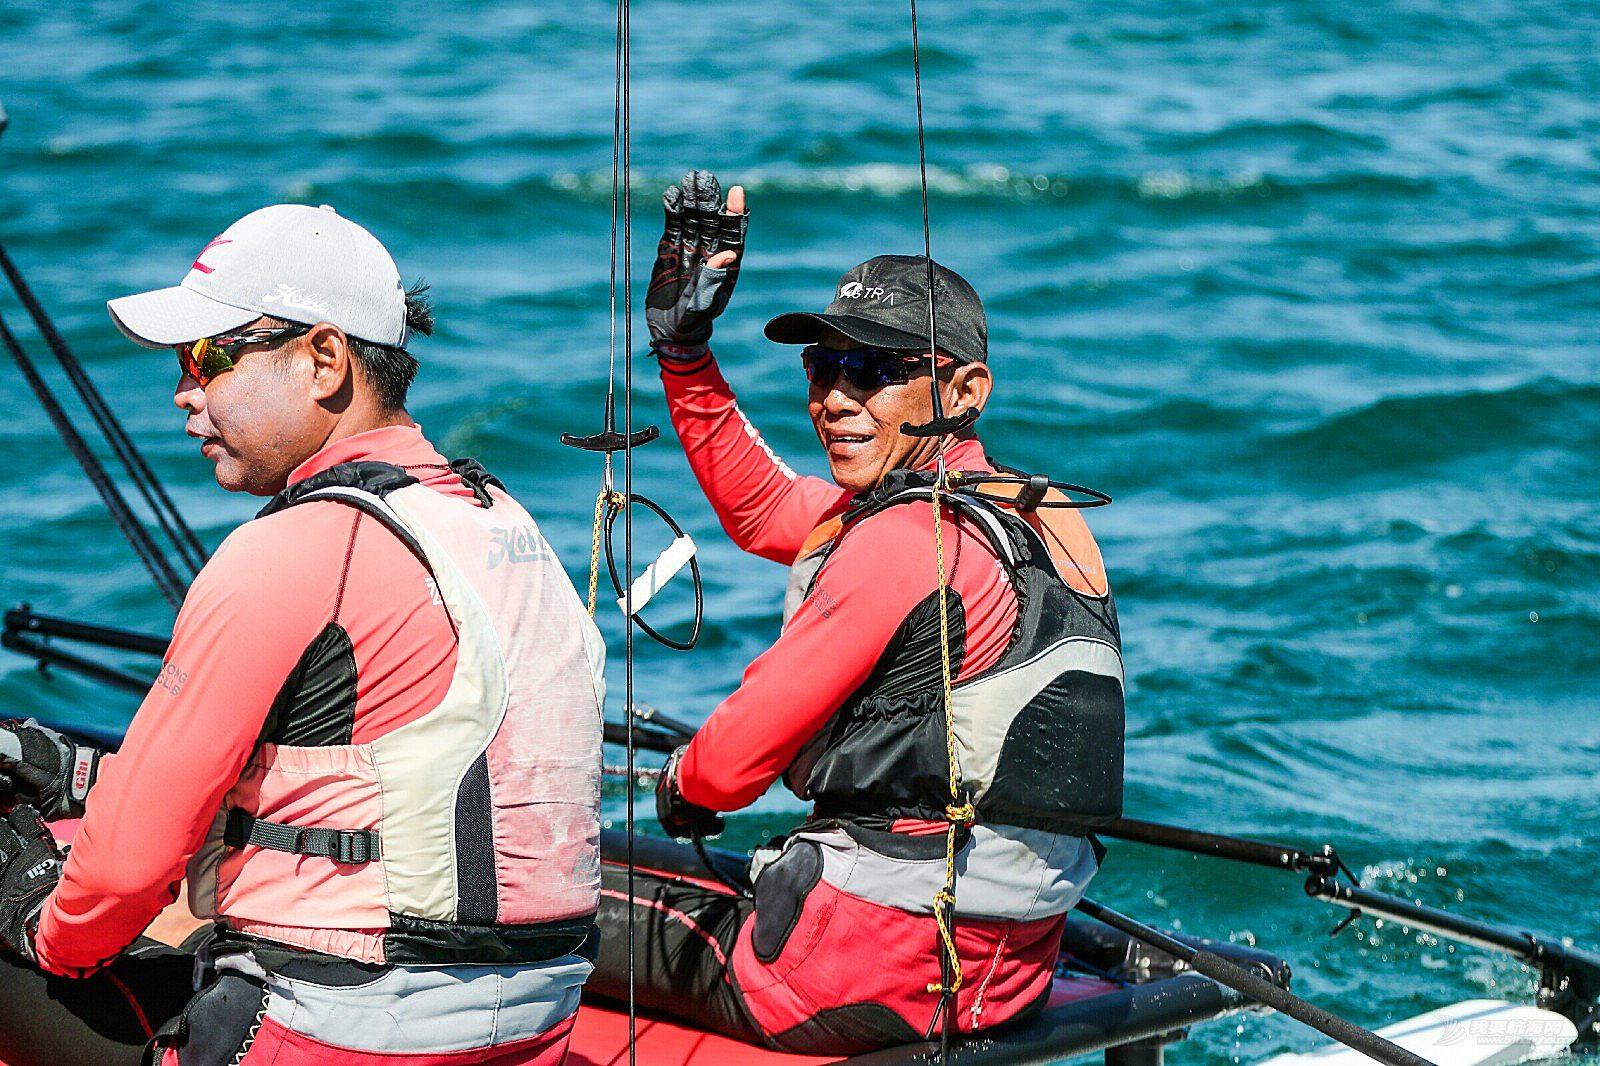 Hobie16级别帆船赛首次登陆大连金石滩   首日开赛选手激烈角逐